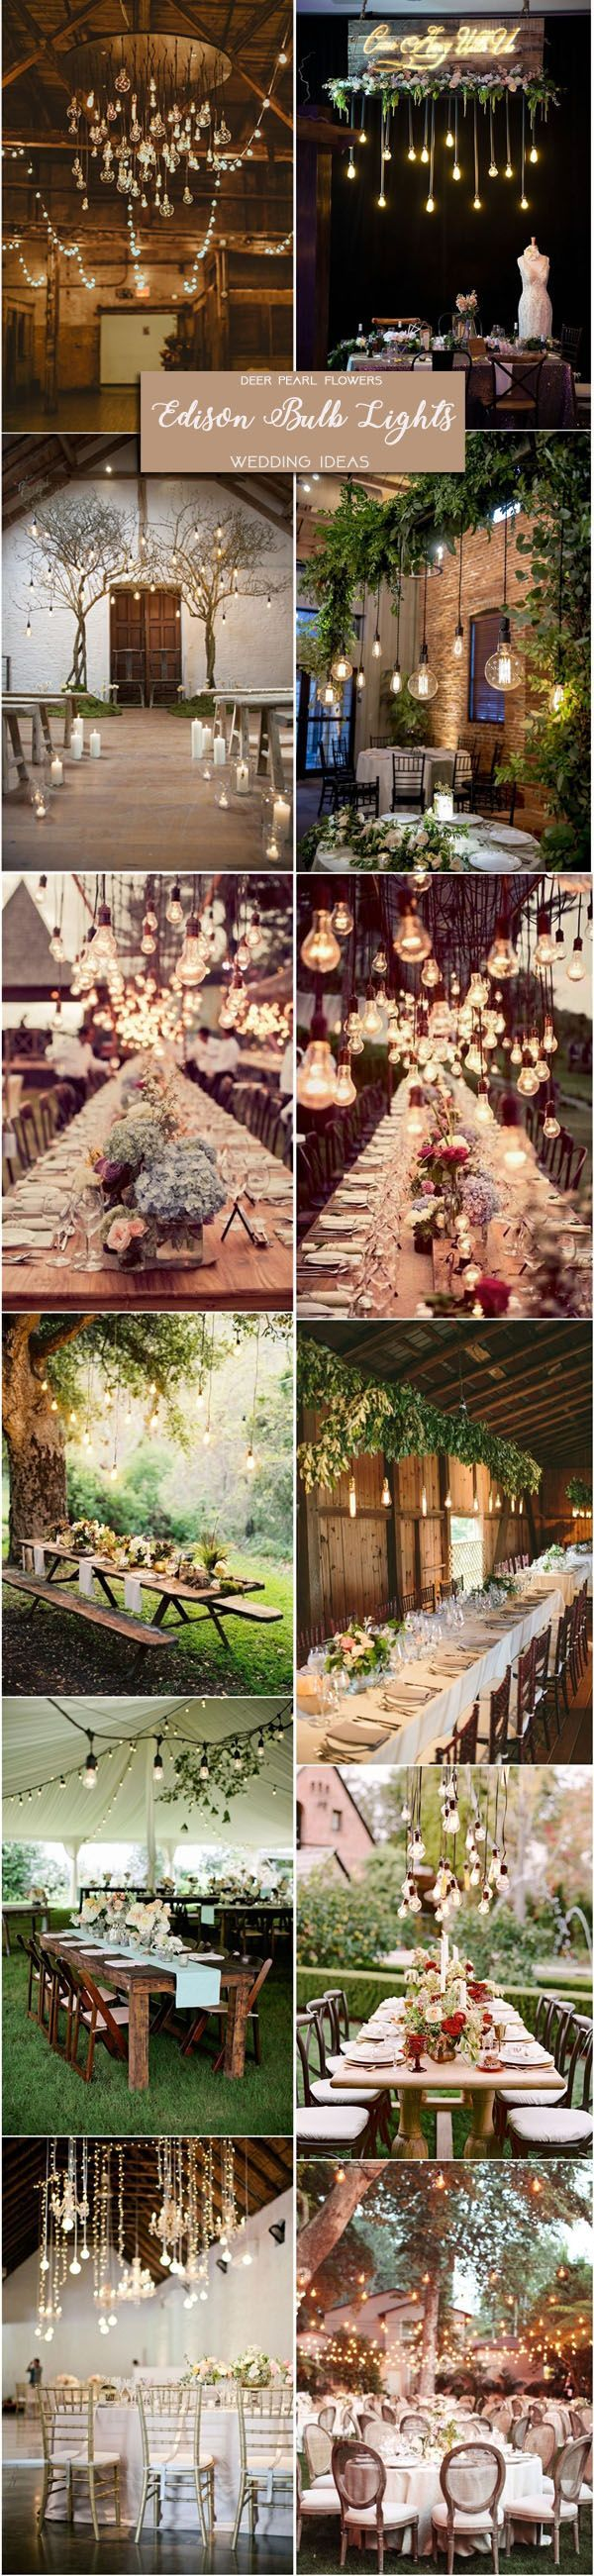 rustic wedding ideas edison bulb light wedding decor ideas /  / http://www.deerpearlflowers.com/rustic-wedding-themes-ideas-part-2/